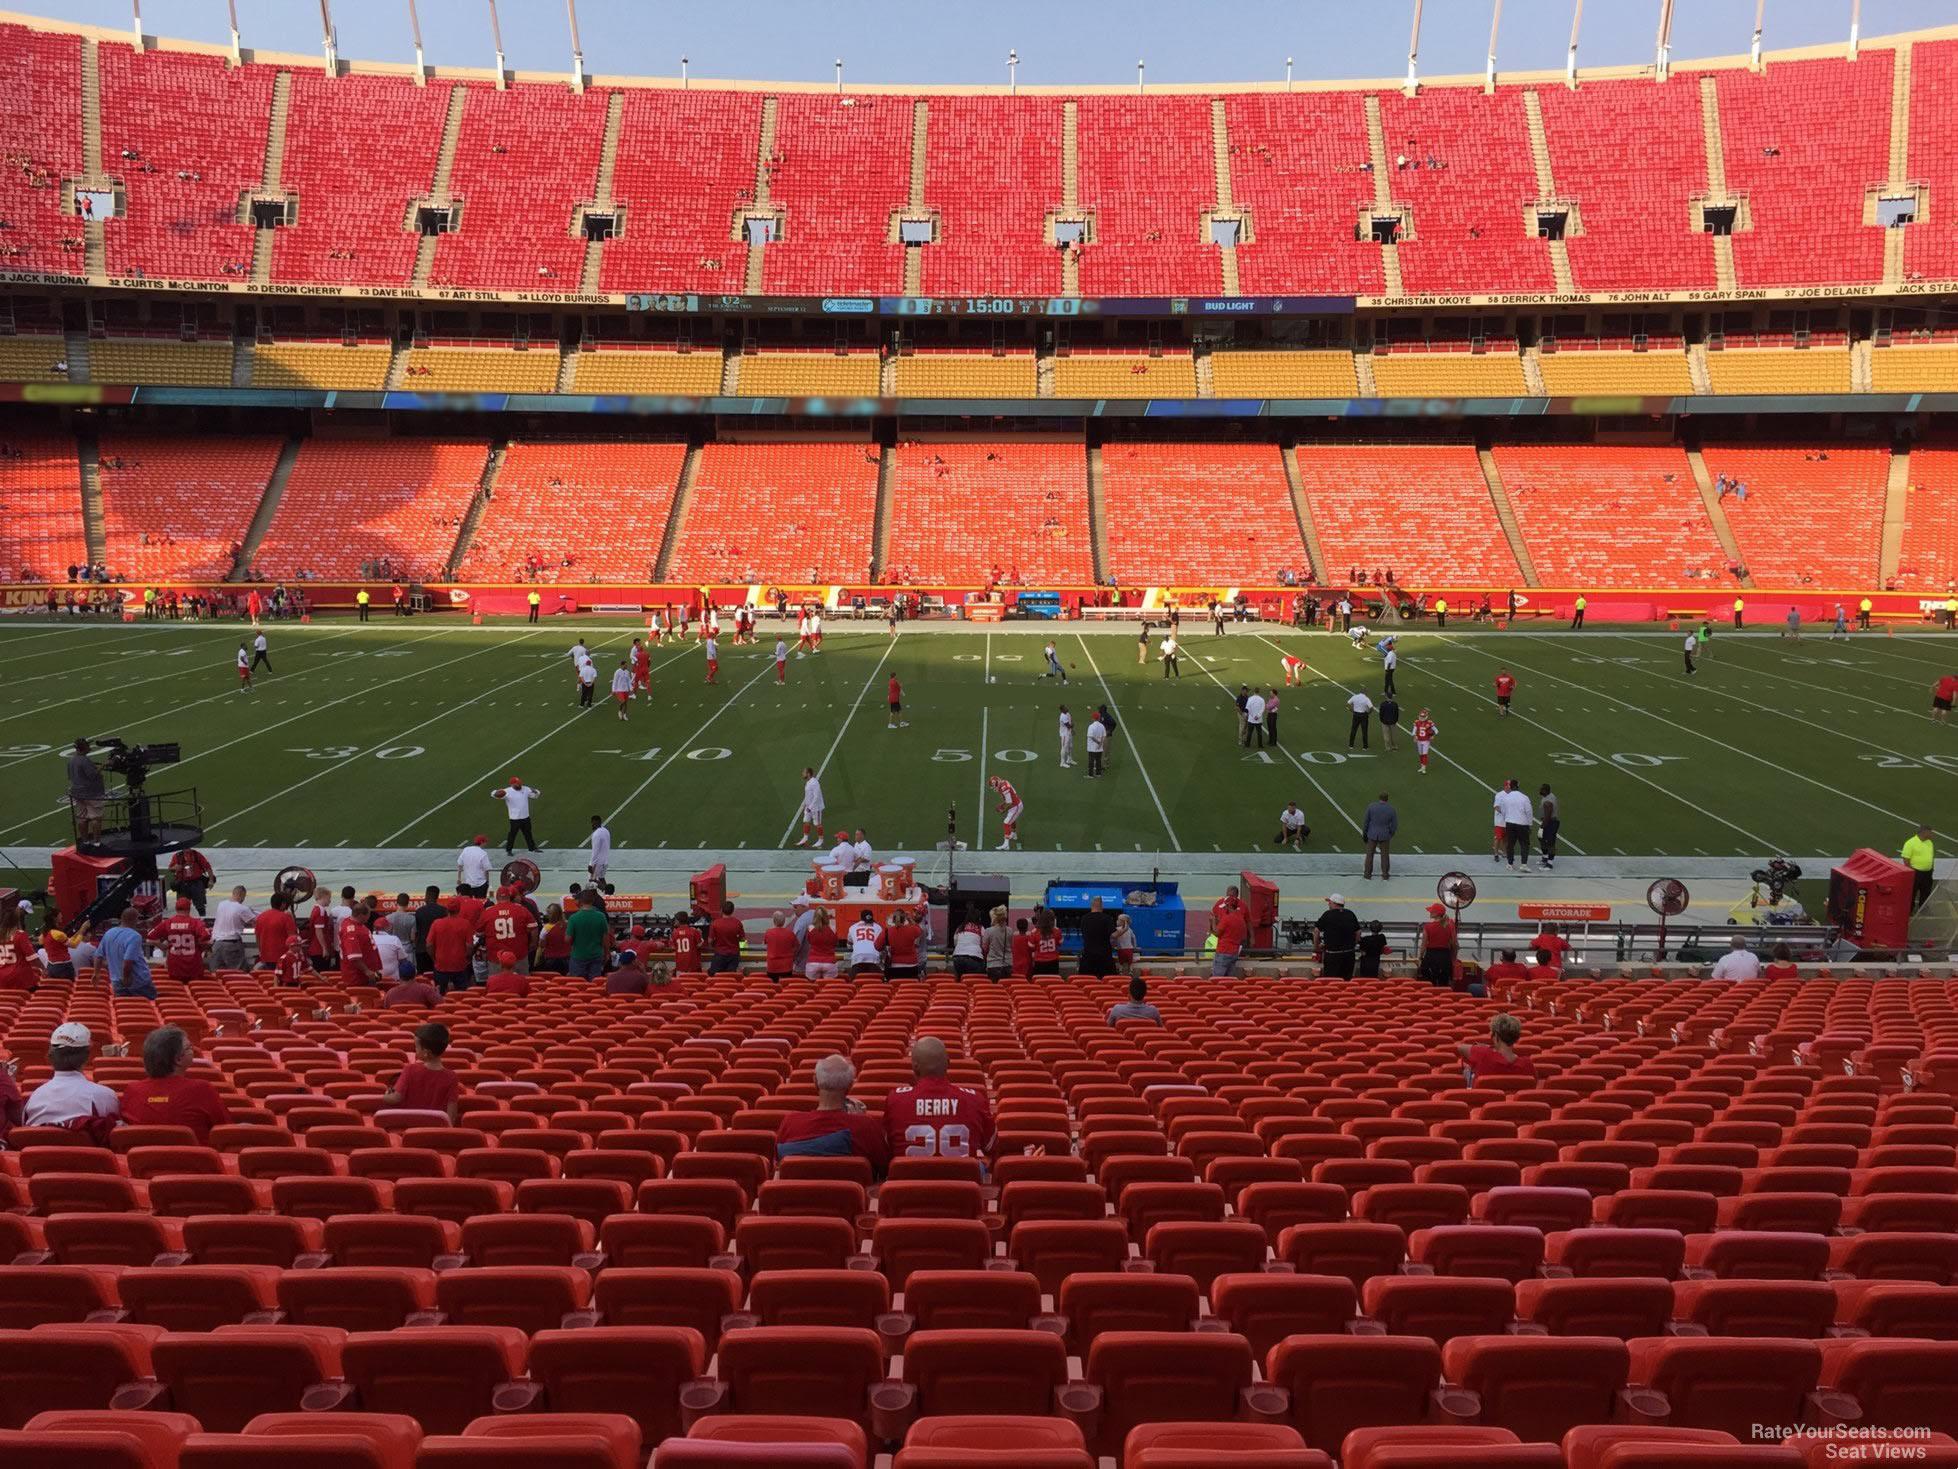 Arrowhead Stadium Section 119 - RateYourSeats.com